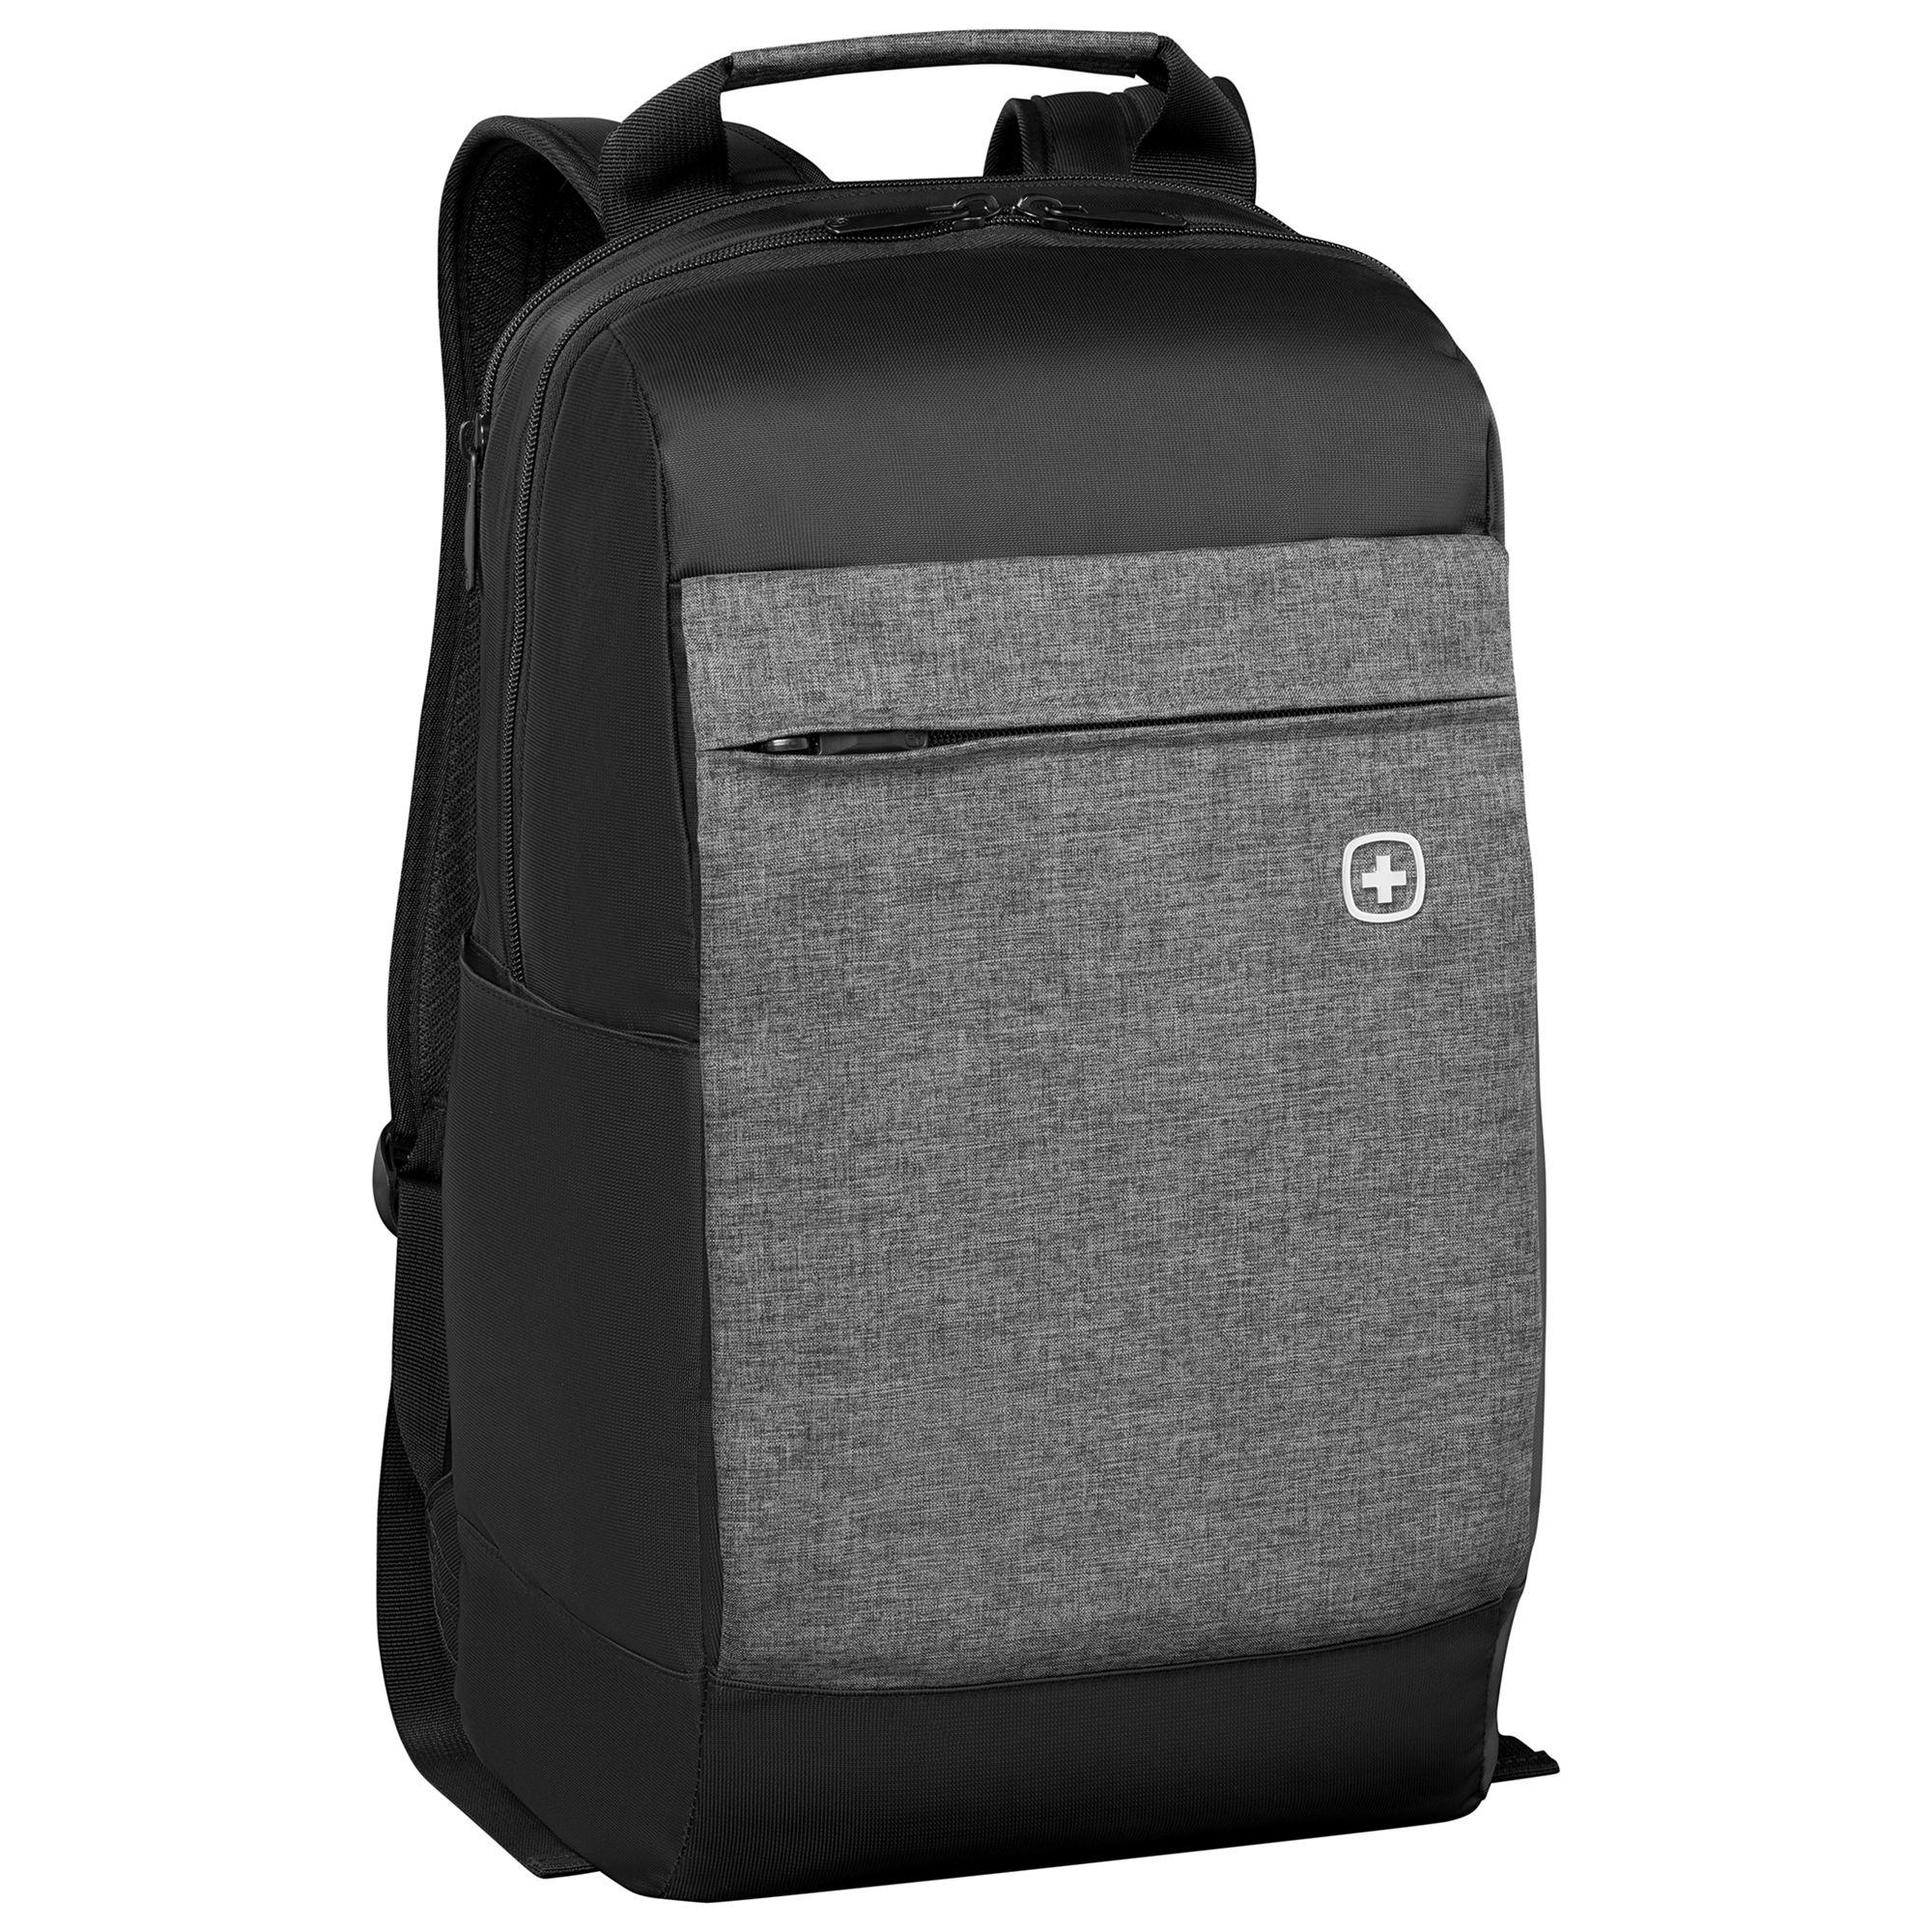 Wenger Wenger Bahn 16 Laptop Backpack, Black